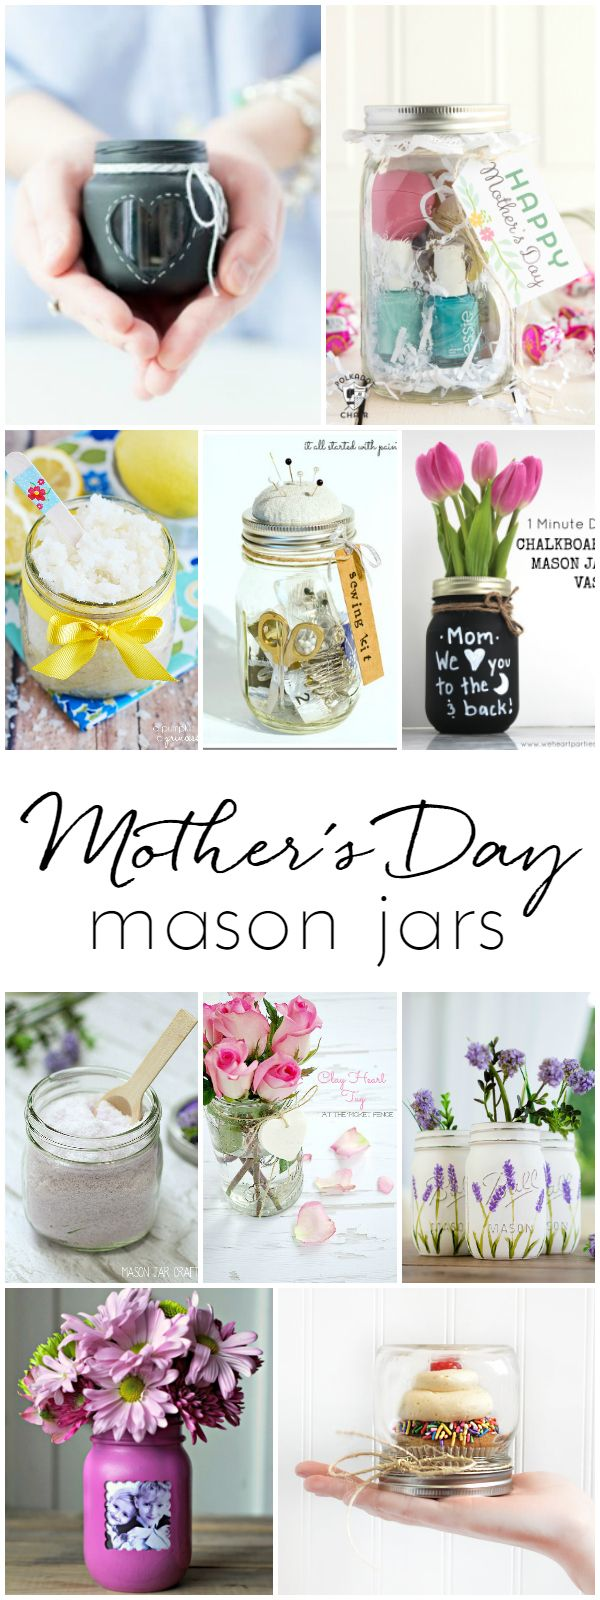 Mother's Day Gift Ideas in Mason Jars - Homemade Gift Ideas for Mother's Day - Mason Jar Gift Ideas @masonjarcraftslove.com